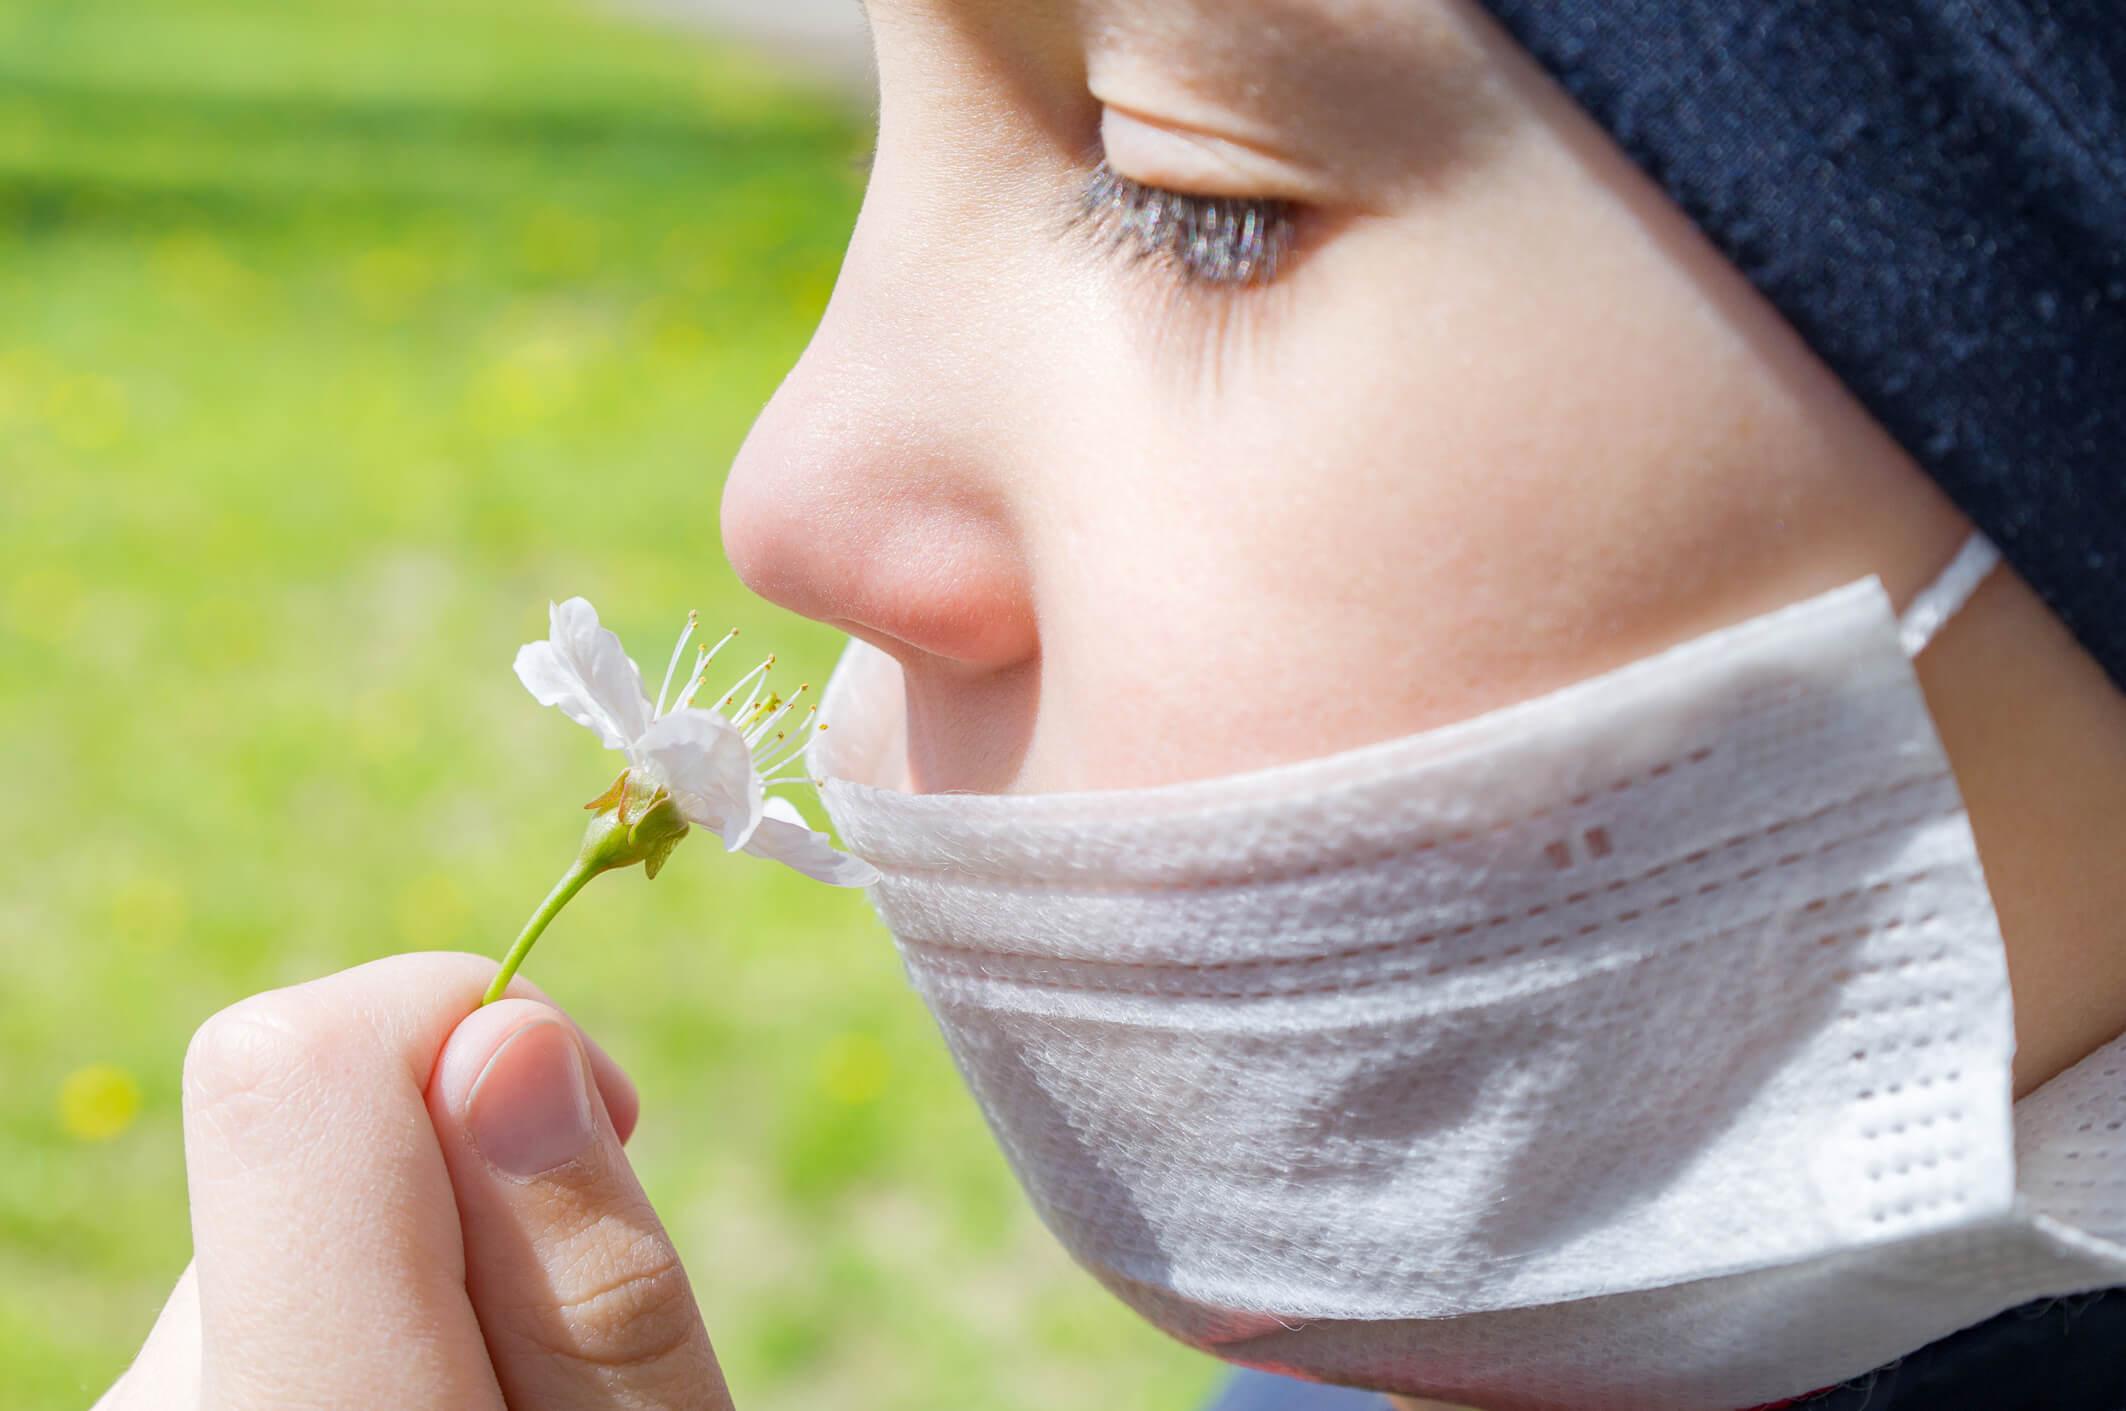 La perte de l'odorat, symptôme précoce de la Covid-19?